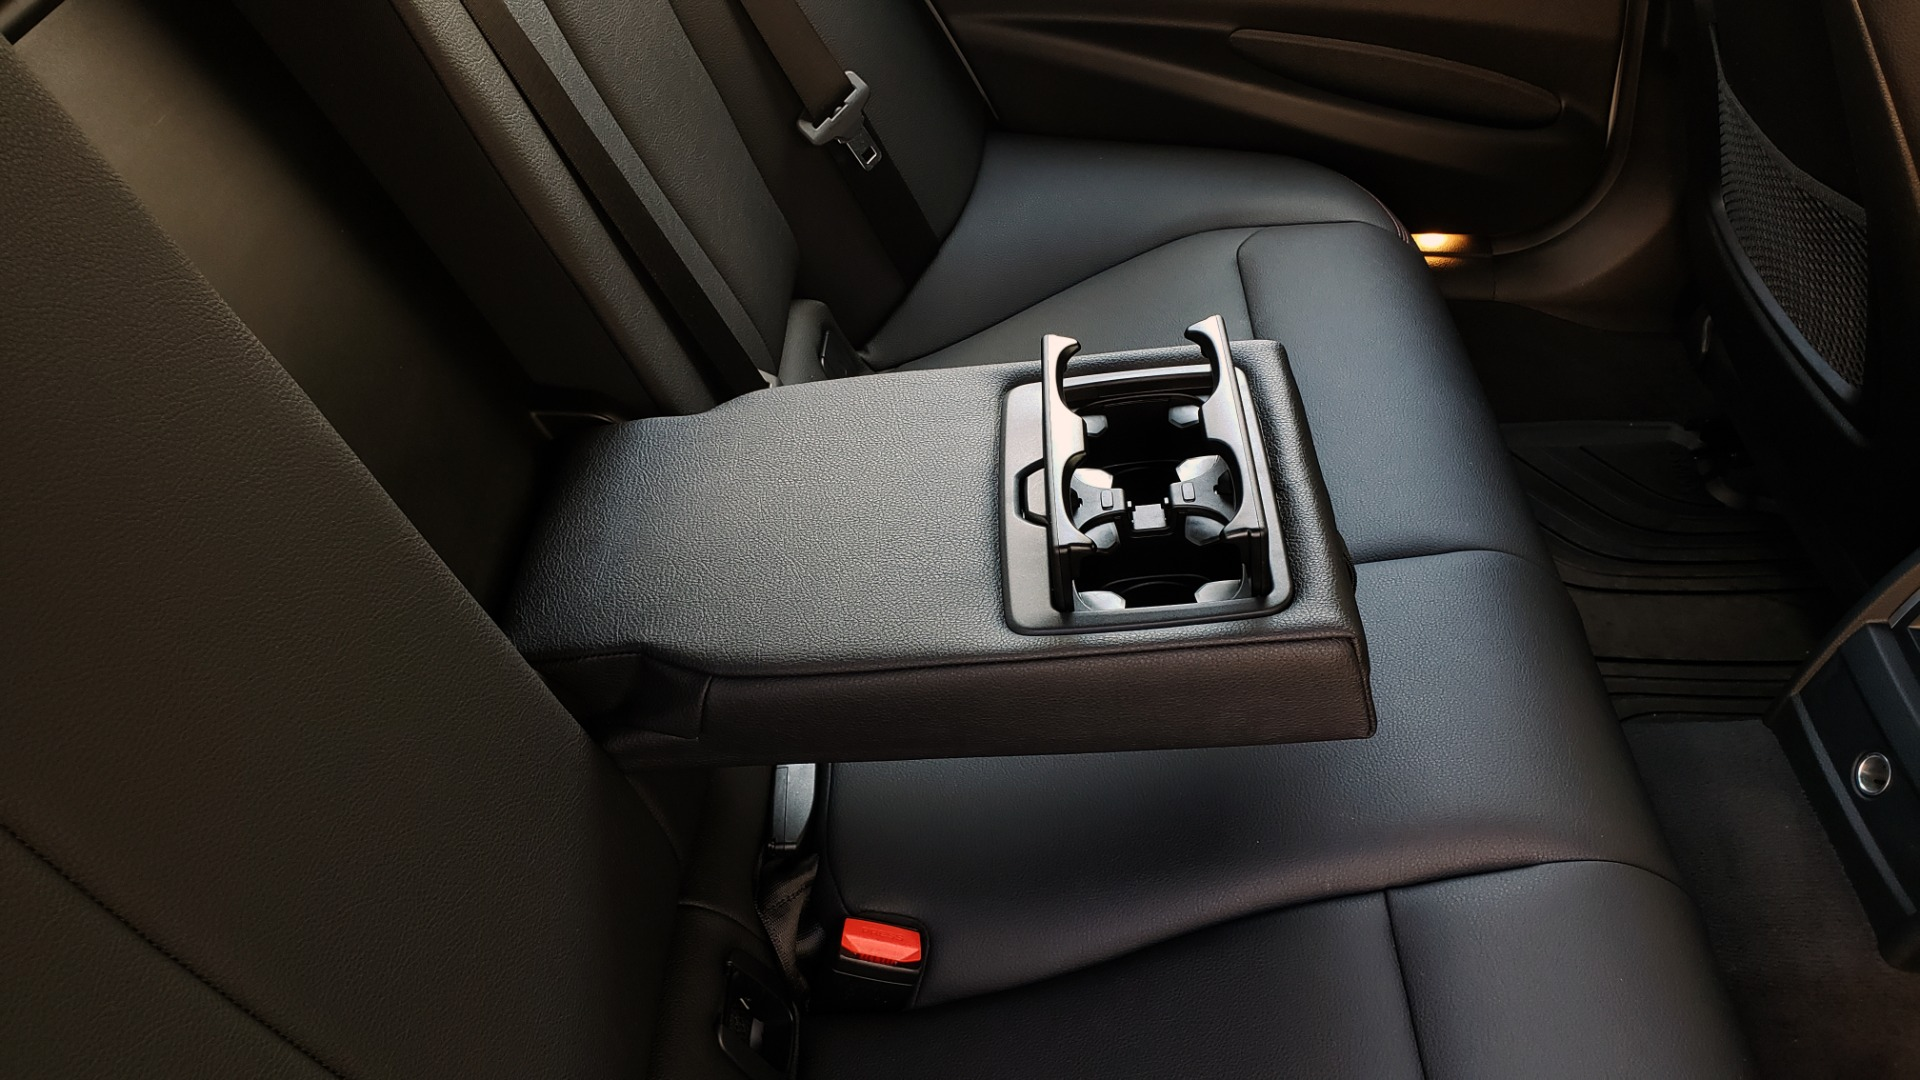 Used 2017 BMW 3 SERIES 330I SPORT SEDAN / DRVR ASST PKG / SUNROOF / REARVIEW for sale Sold at Formula Imports in Charlotte NC 28227 72